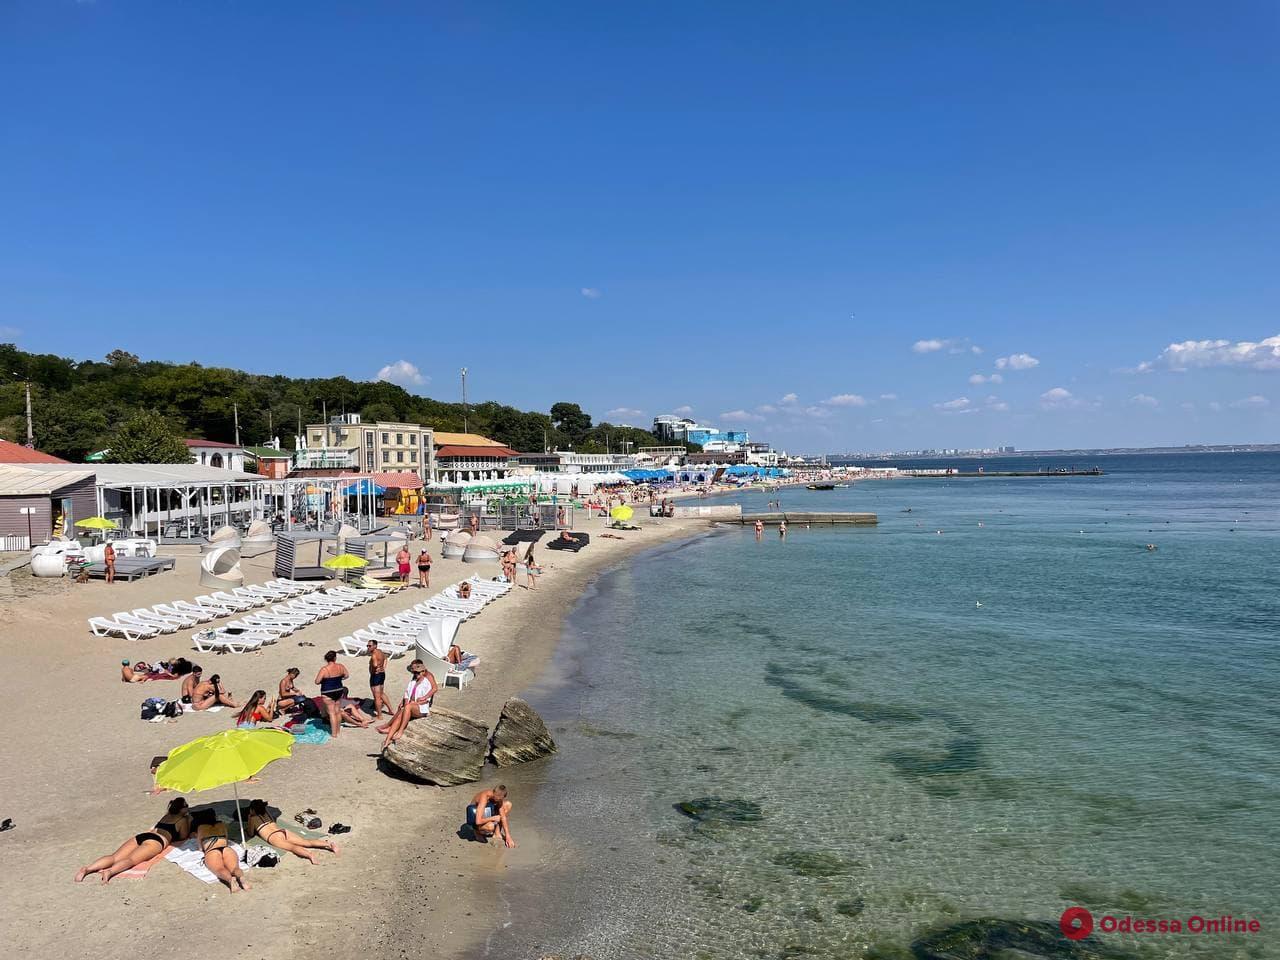 Синоптики дали прогноз погоды в Одессе на завтра